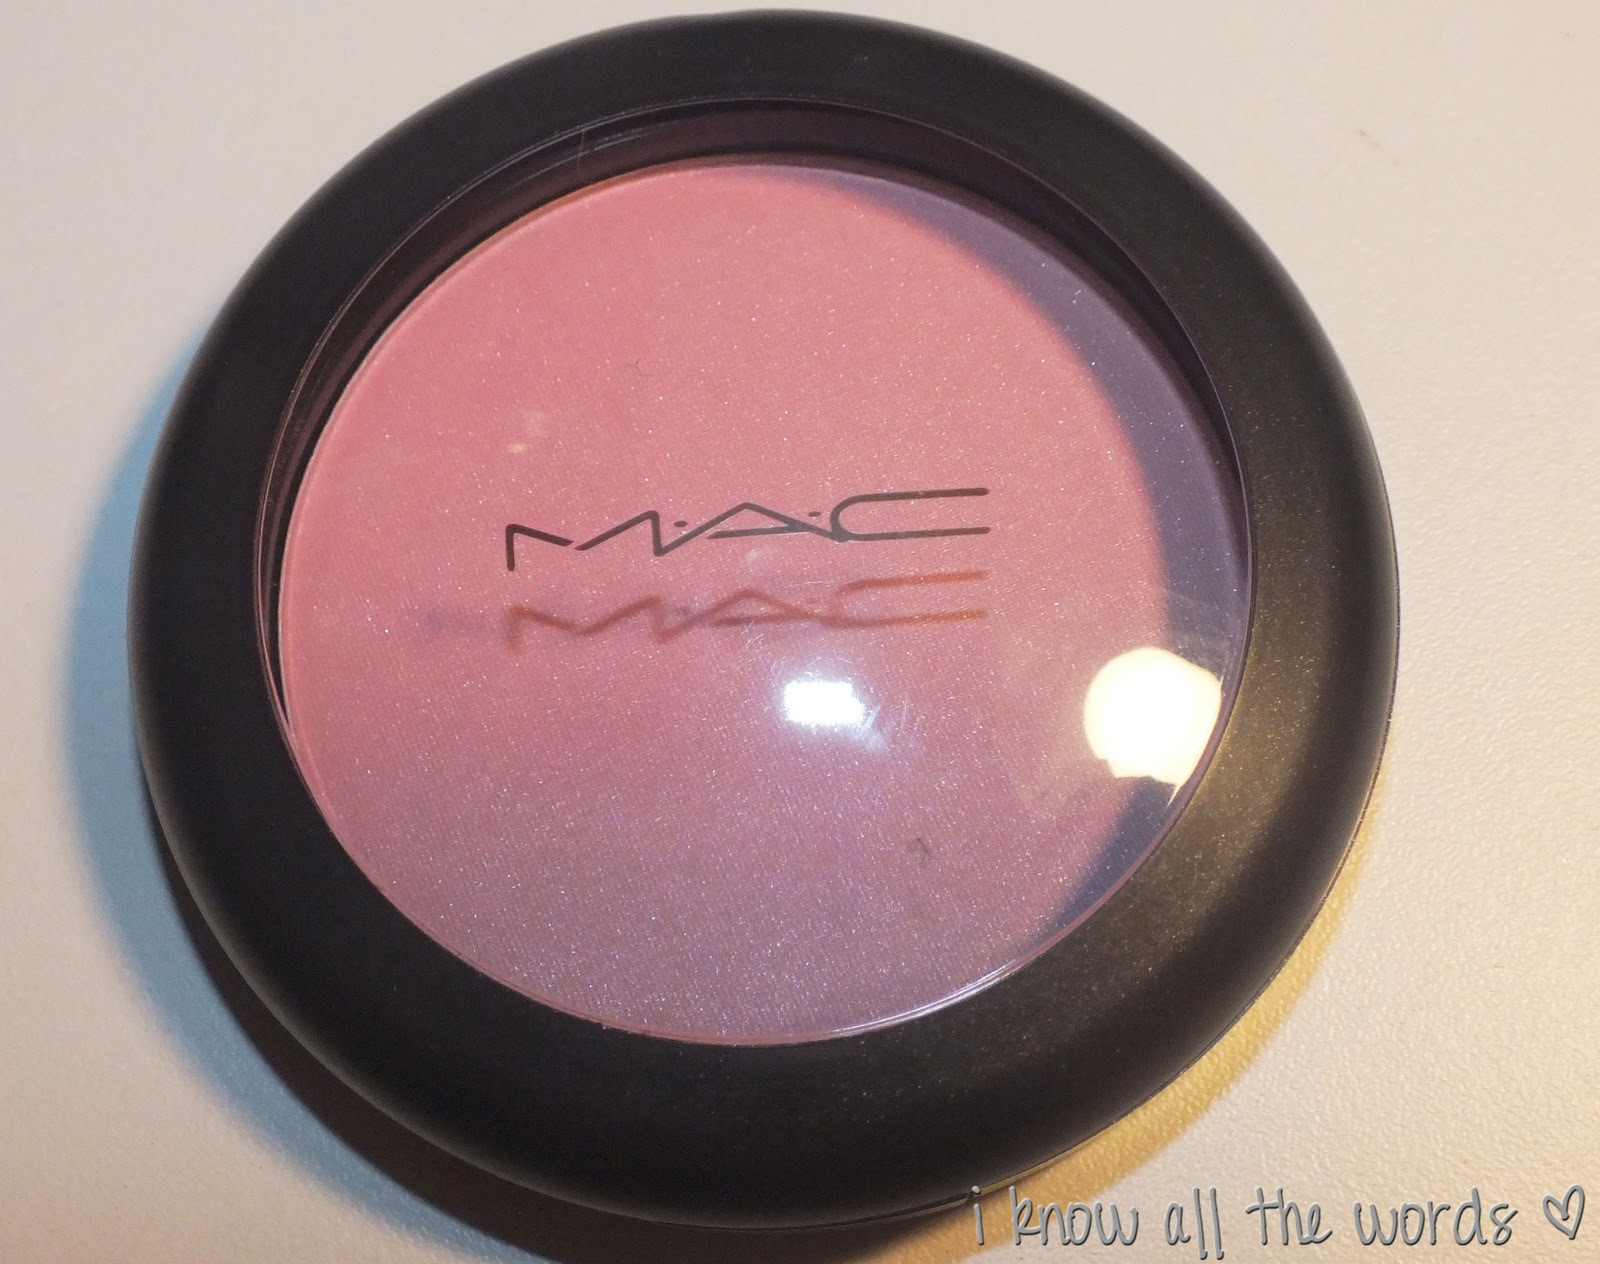 mac azalea blossom blush - photo #4